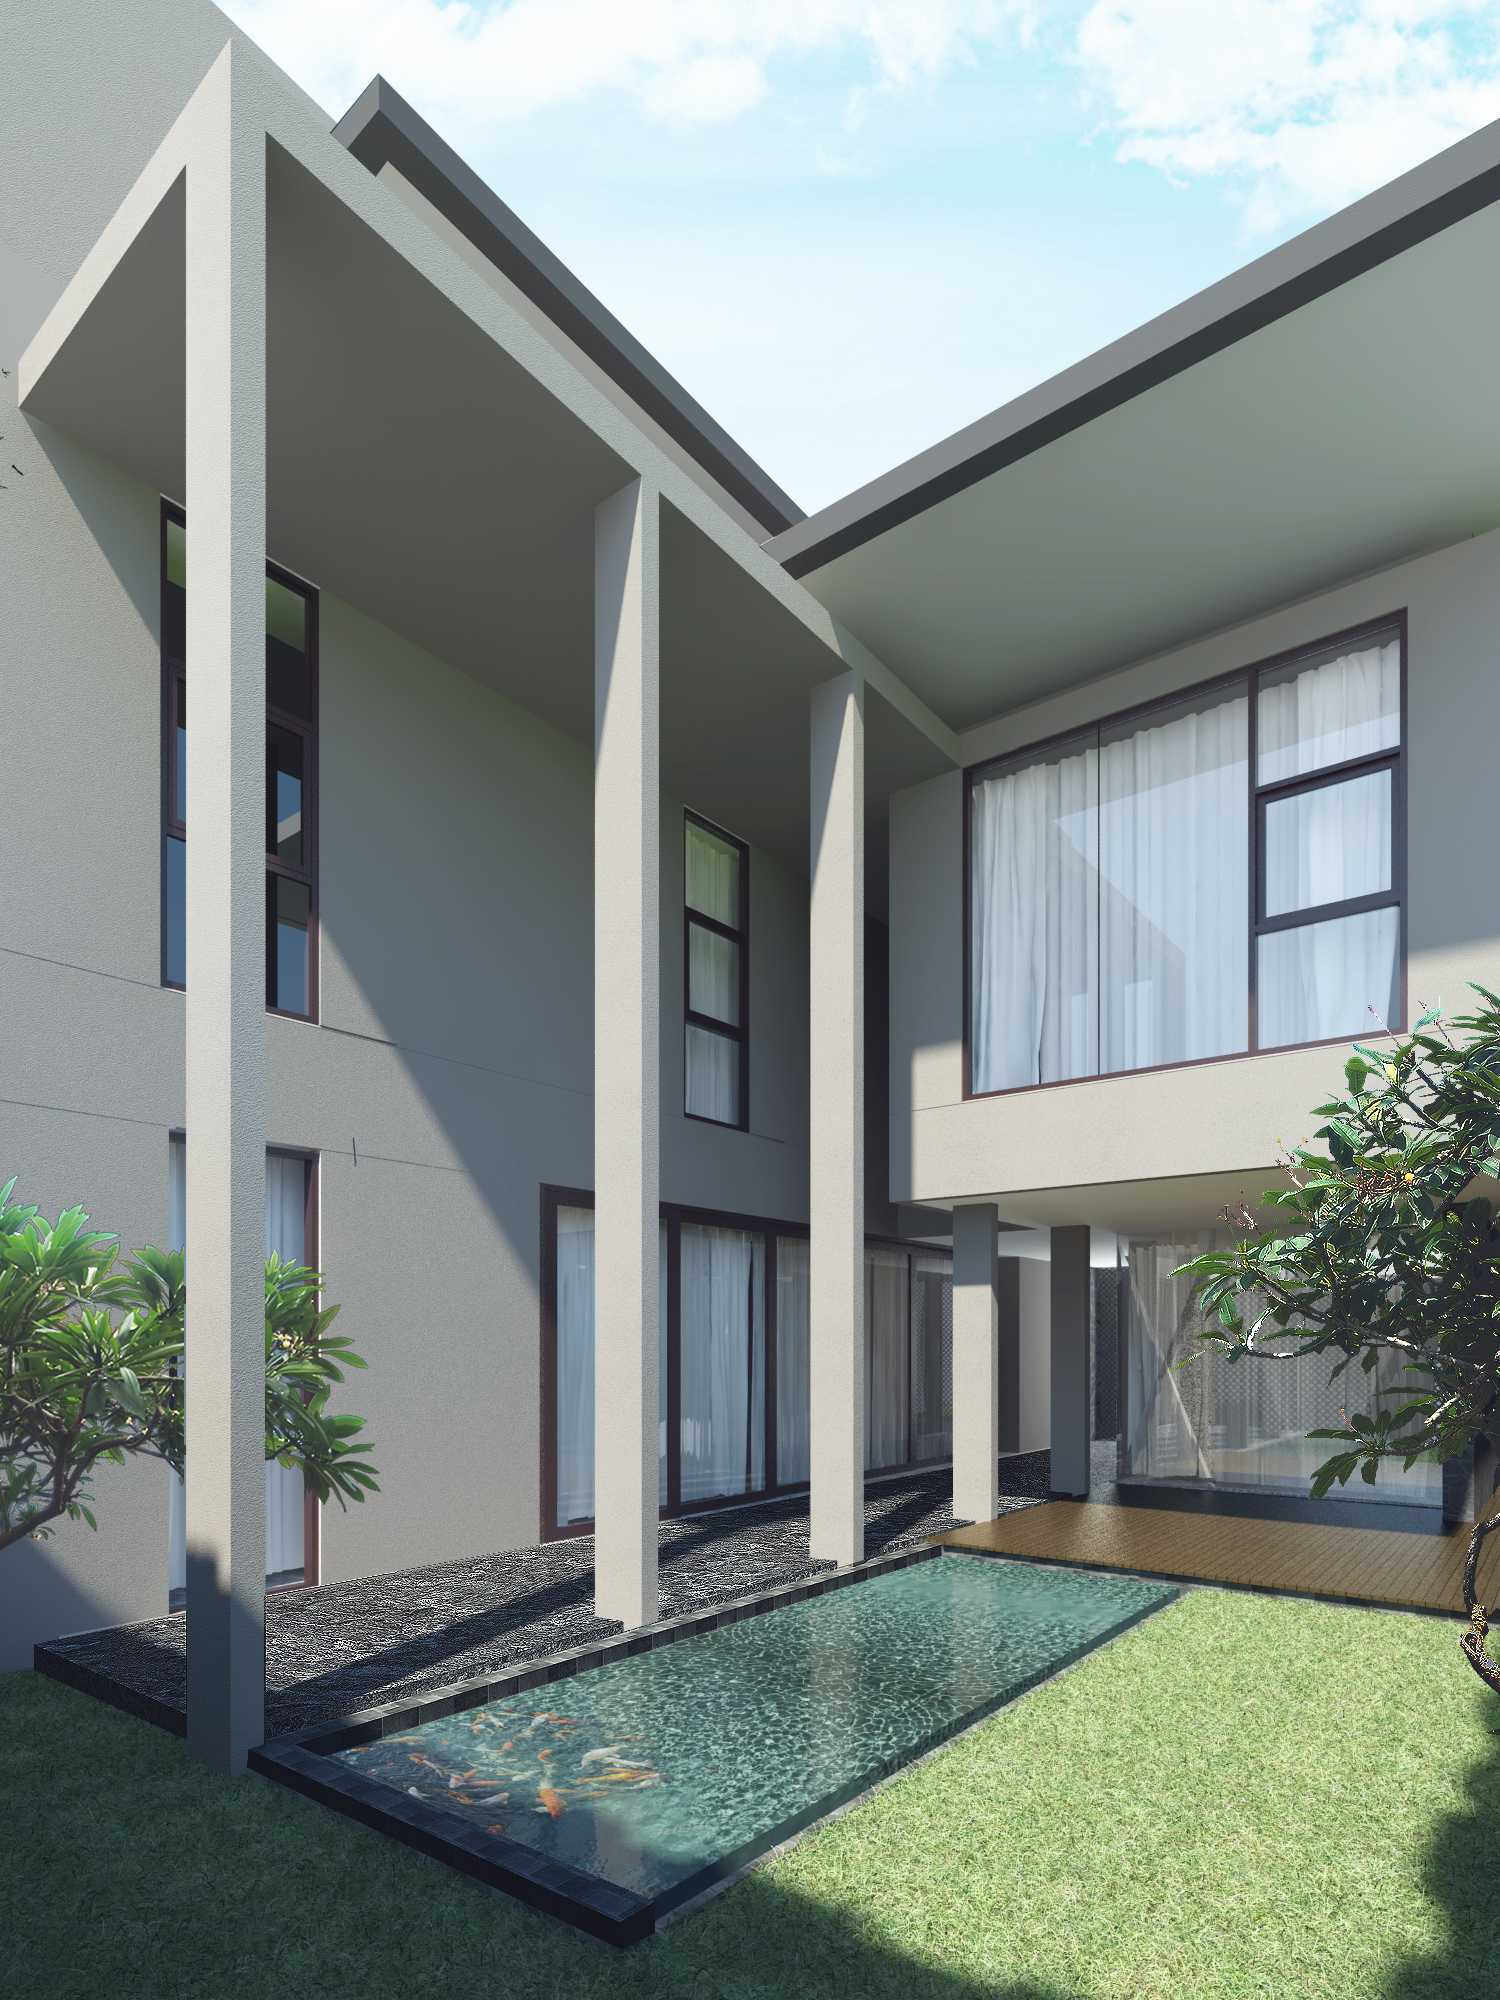 Pt. Modula The Canvas House Pondok Indah, Jakarta Pondok Indah, Jakarta The Backyard Modern  26639